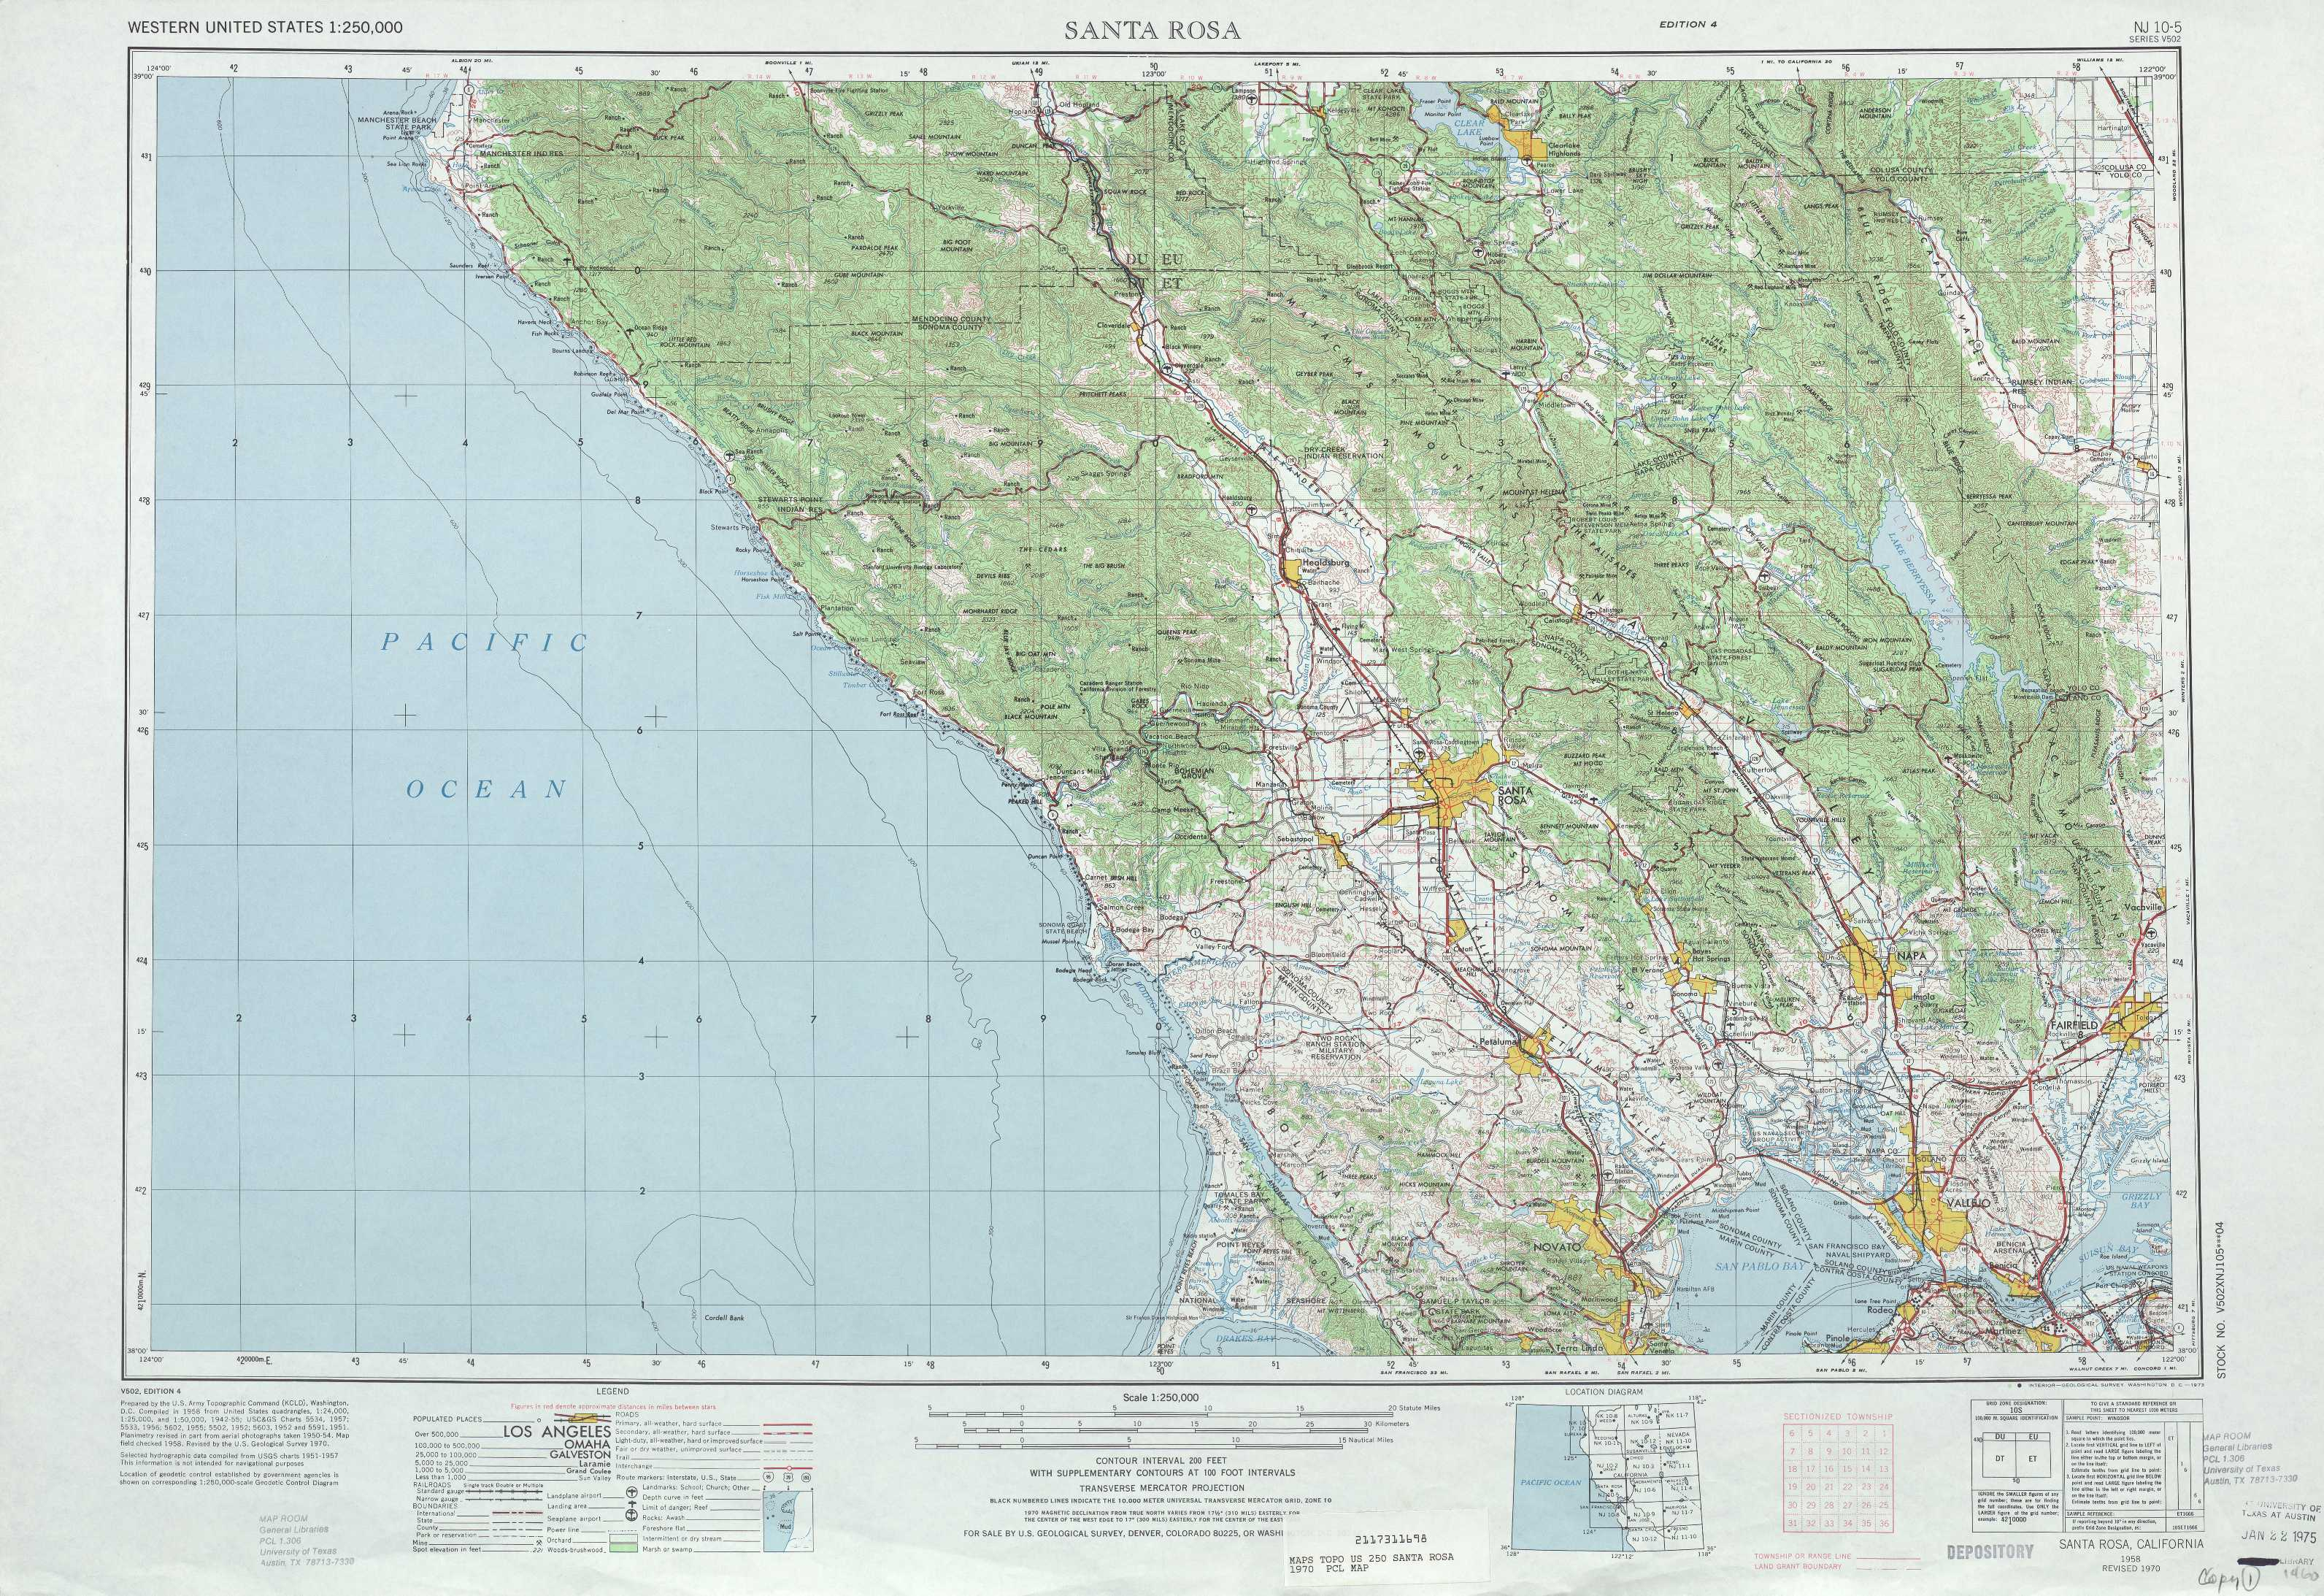 Santa Rosa topographic maps, CA - USGS Topo Quad 38122a1 at 1 ...